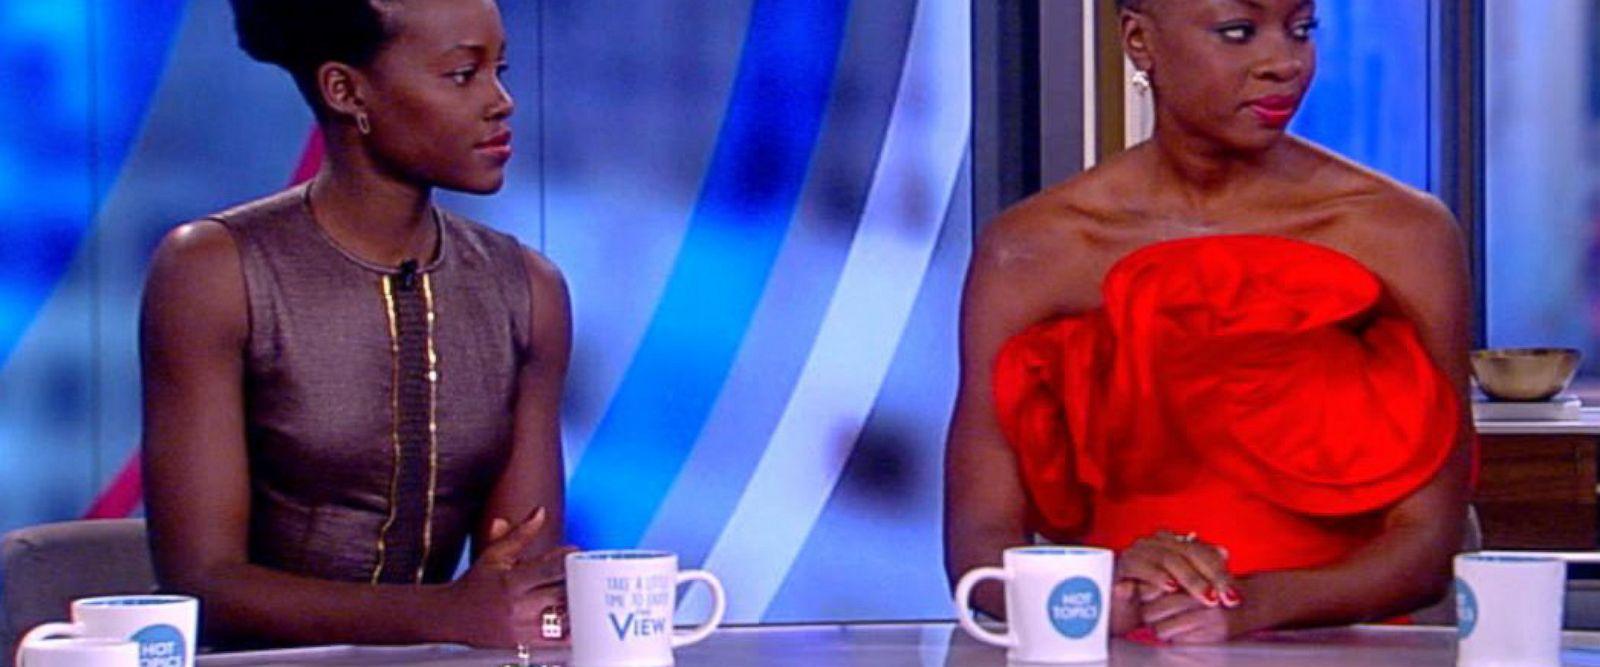 VIDEO: Lupita Nyong'o, Danai Gurira talk 'Black Panther' success